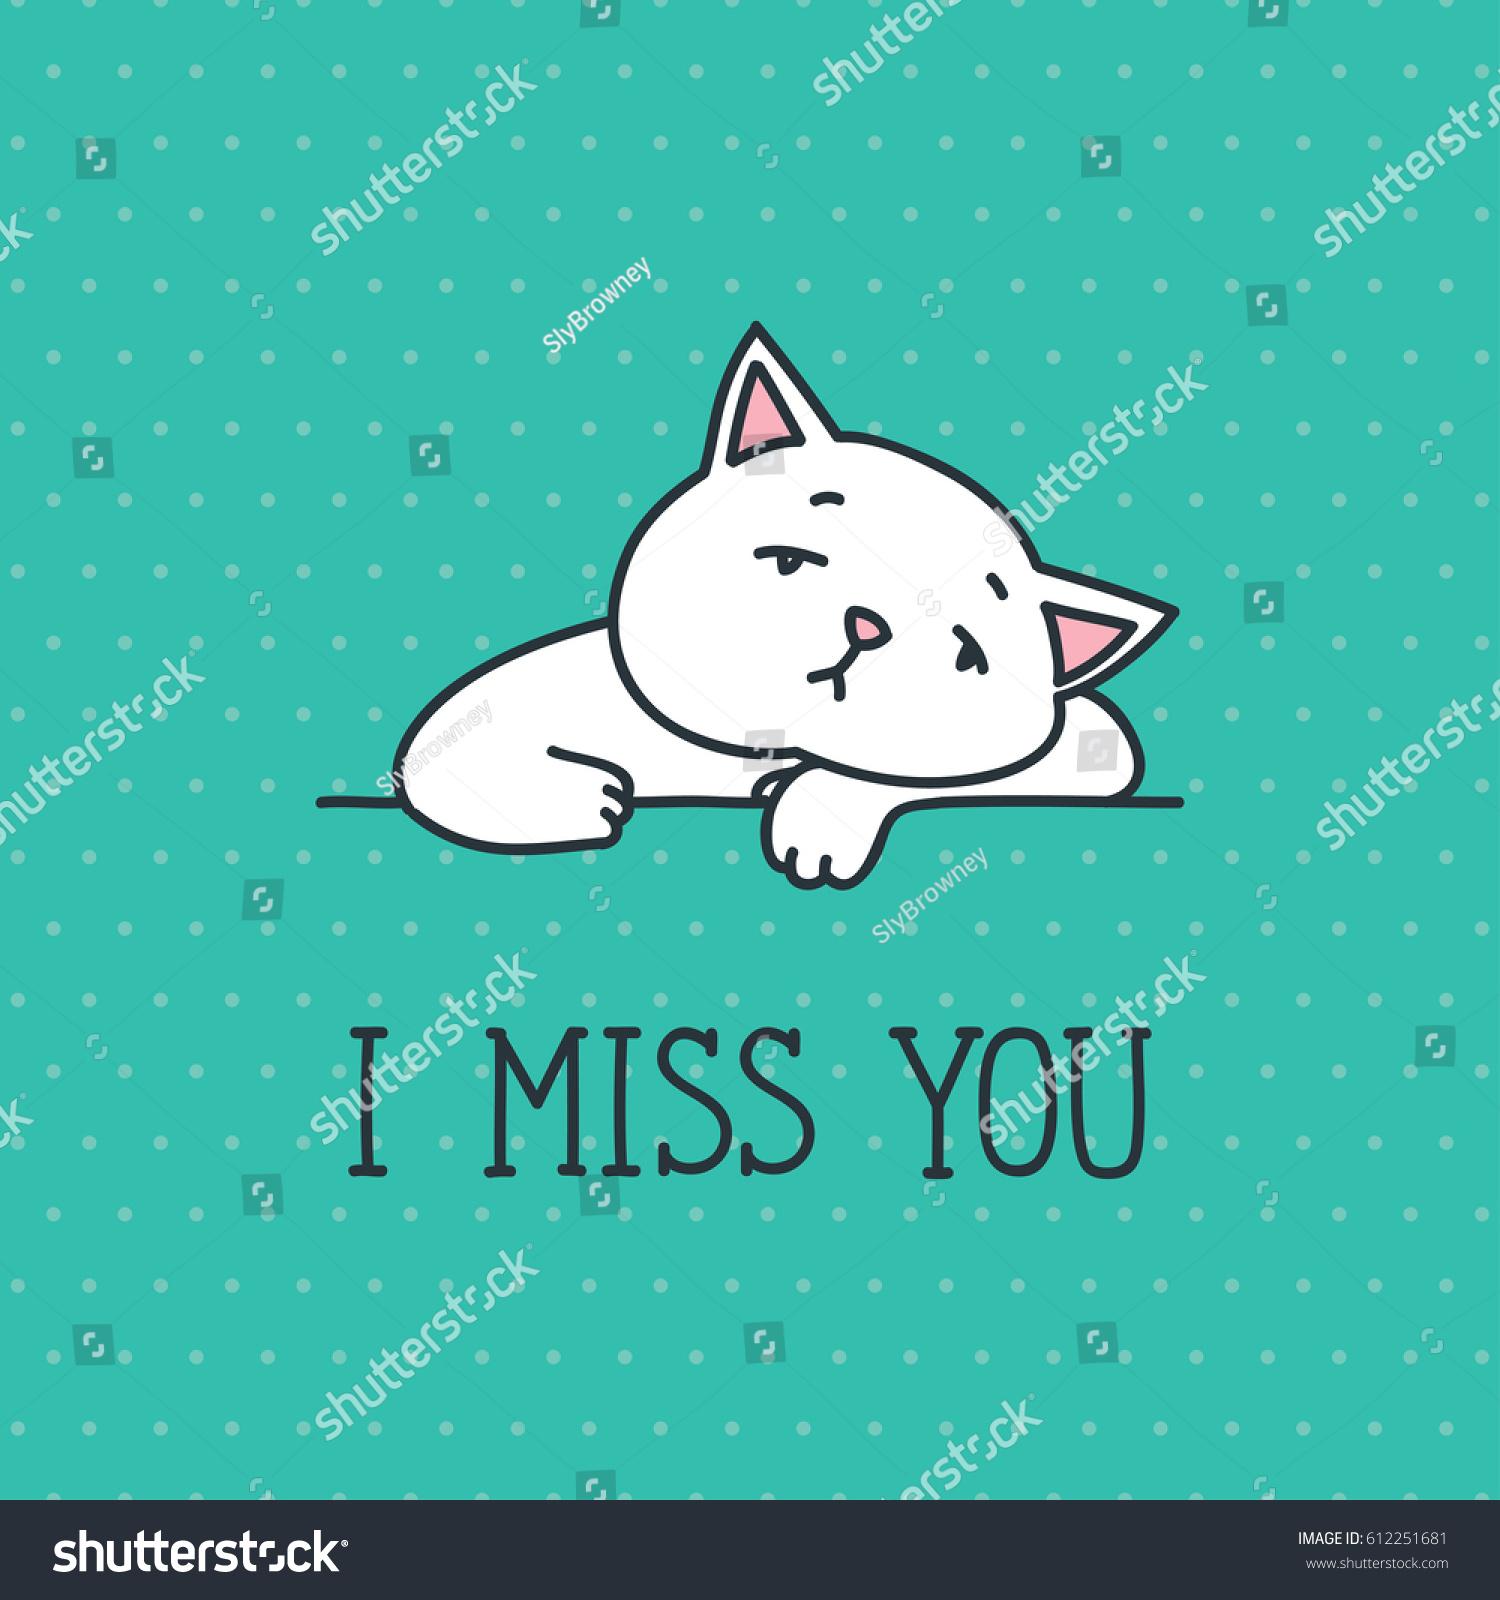 miss you alot